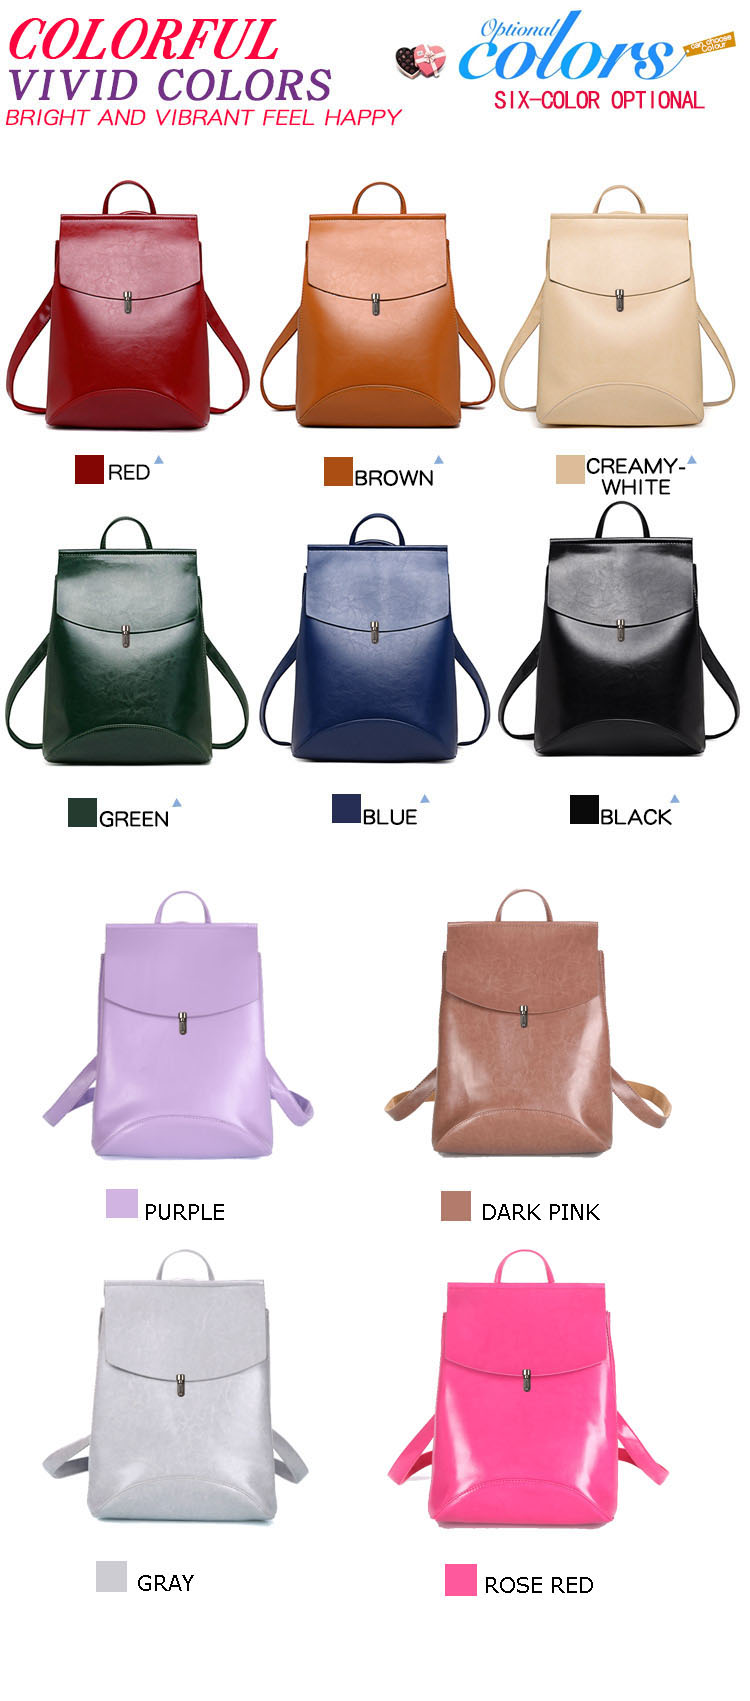 HTB12cENQ4naK1RjSZFtq6zC2VXak HOT Fashion Women Backpack High Quality Youth Leather Backpacks for Teenage Girls Female School Shoulder Bag Bagpack mochila